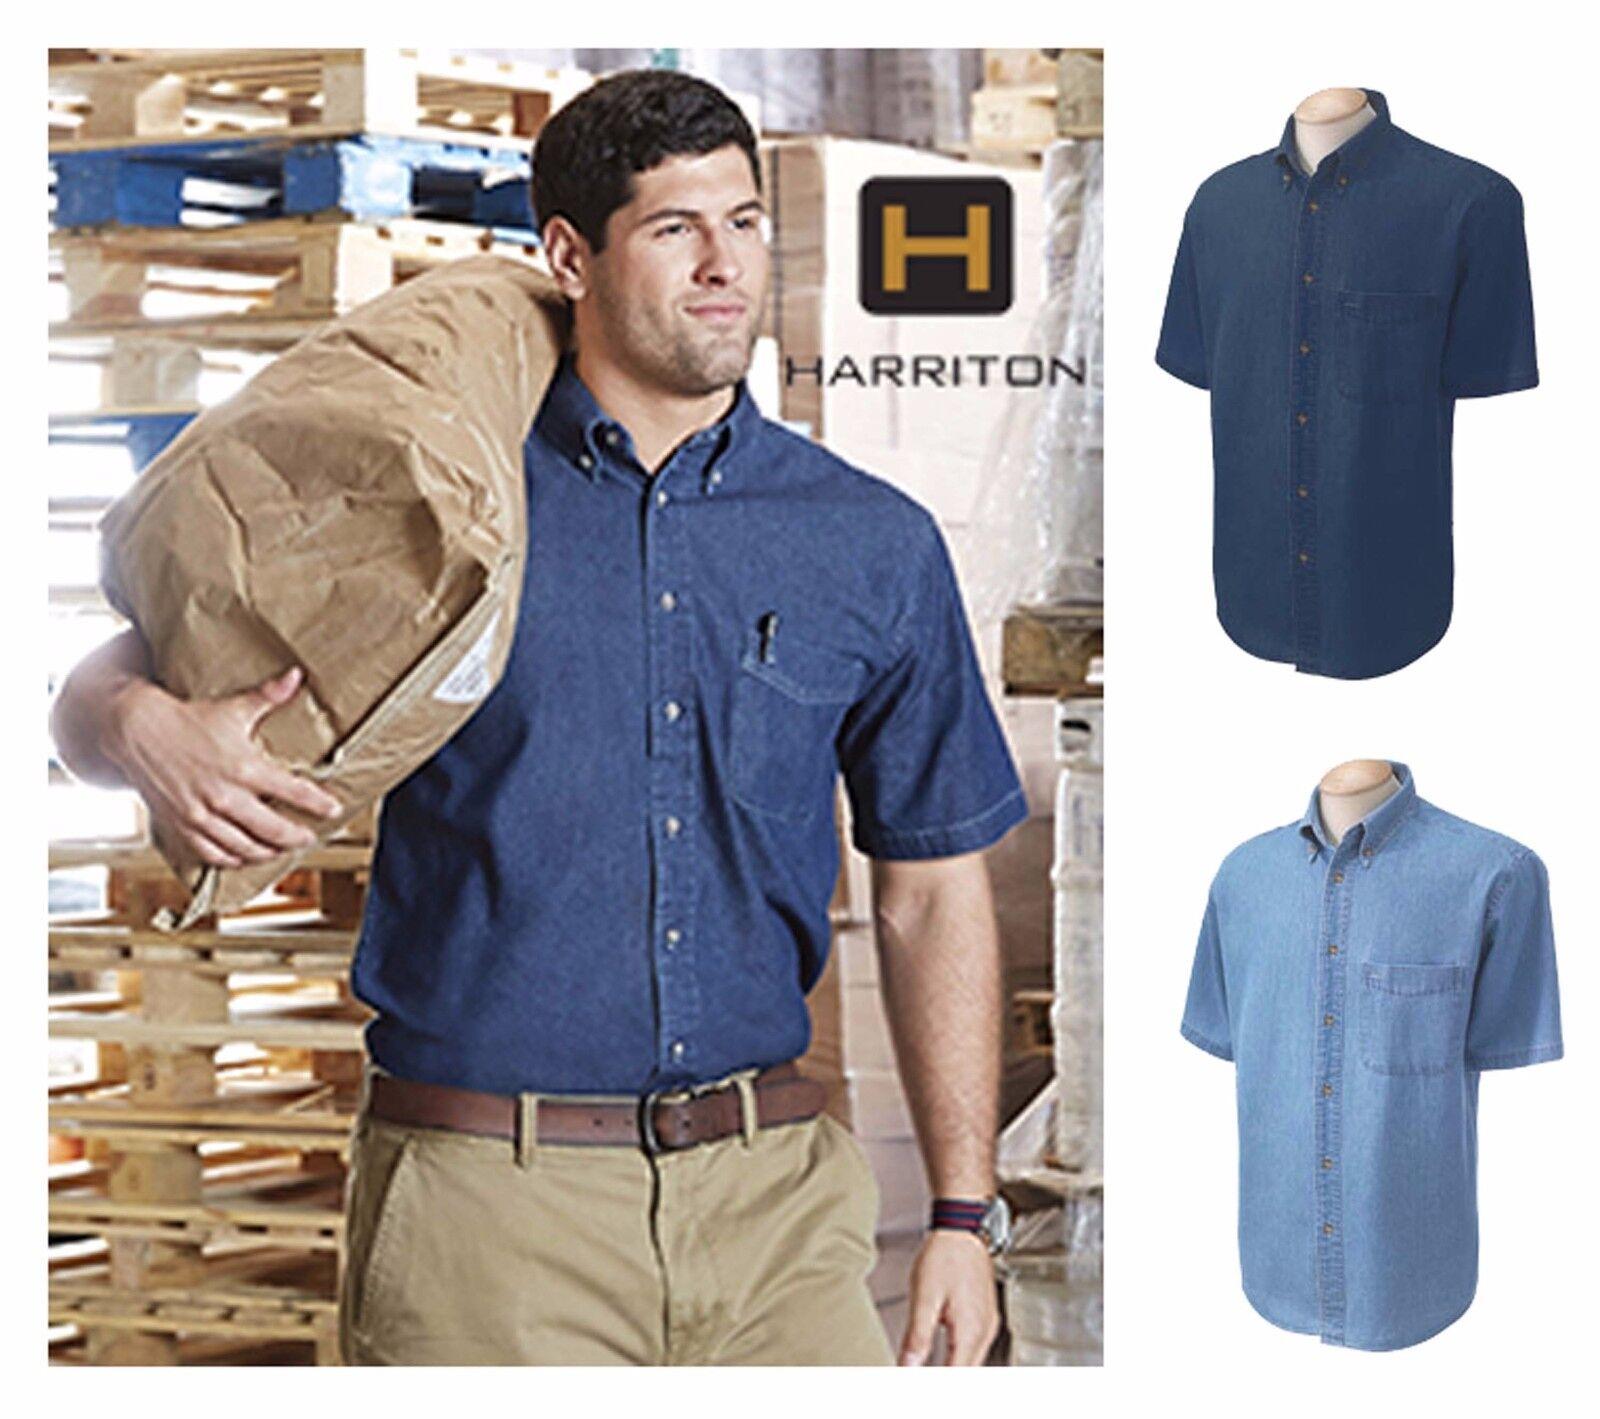 b15bfb19696 Harriton Men s Short-Sleeve Button up 100% Cotton Denim Shirt S-4XL ...